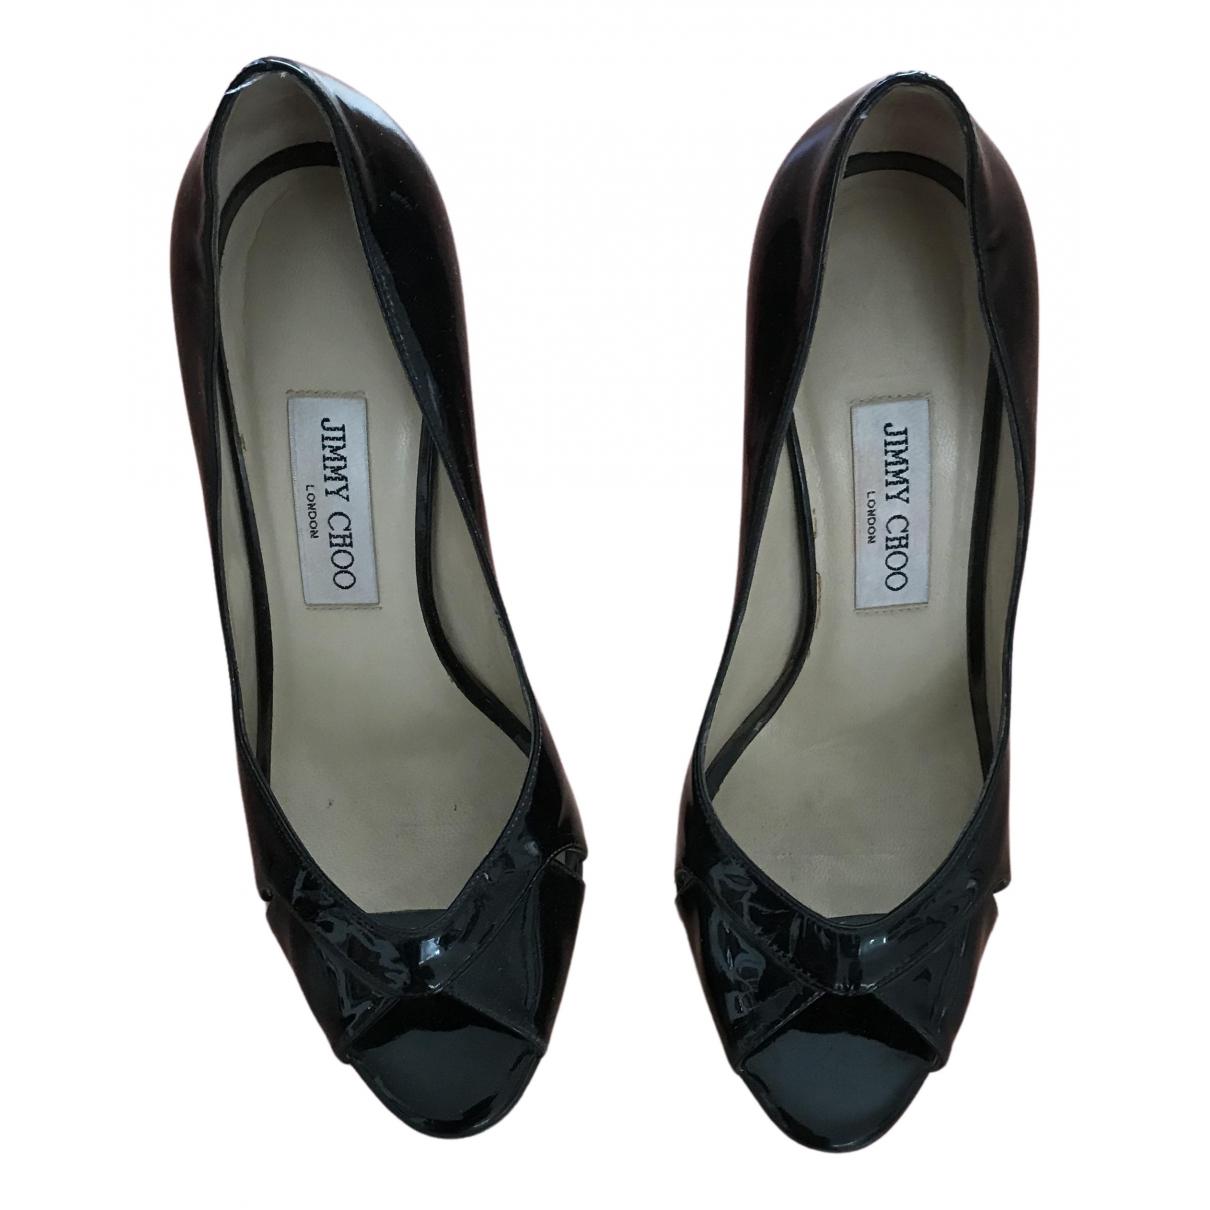 Jimmy Choo N Black Patent leather Heels for Women 38 EU